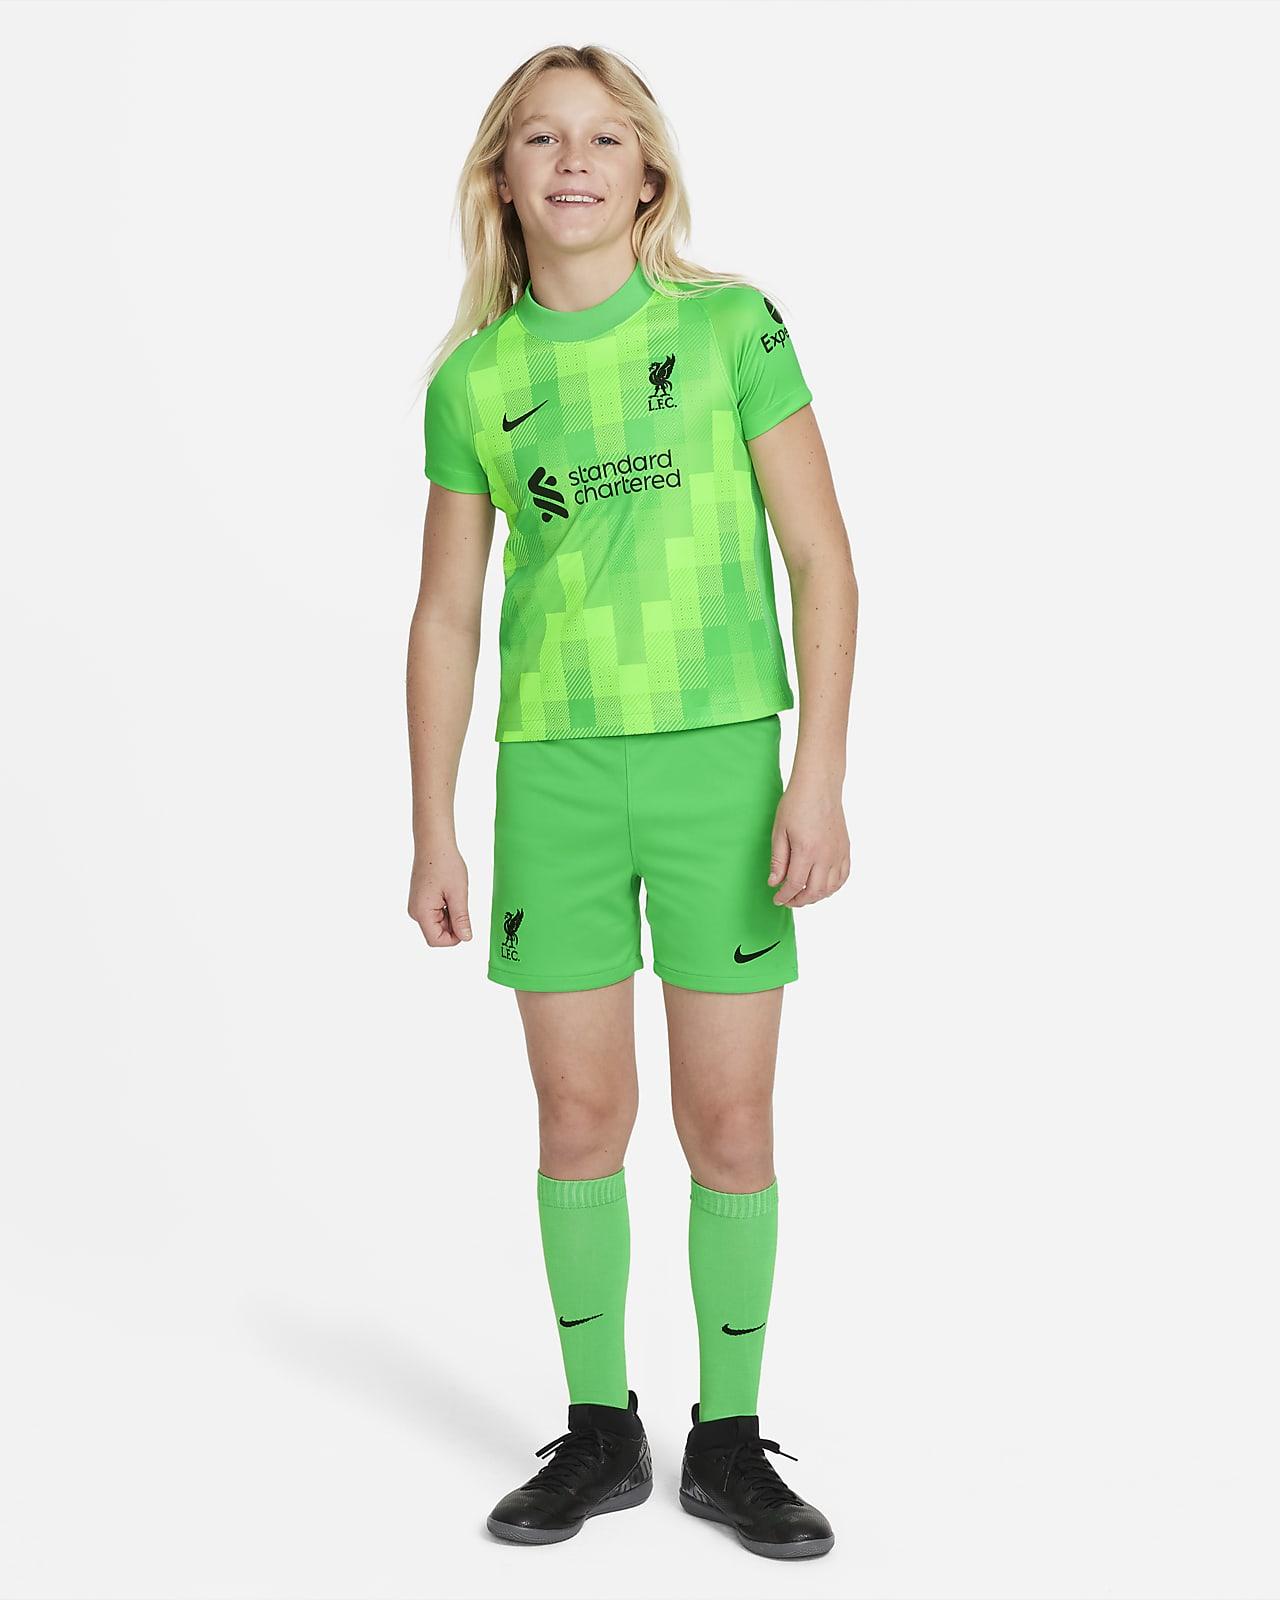 Liverpool FC 2021/22 Goalkeeper Fußballtrikot-Set für jüngere Kinder